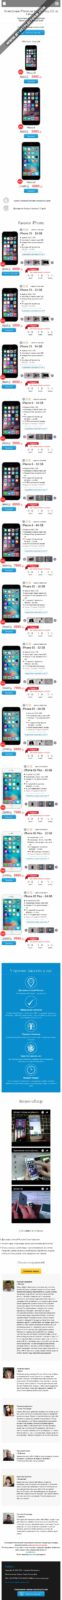 Скриншот лендинга-каталога Iphone 5s-6-6s-6s plus 001 - моб